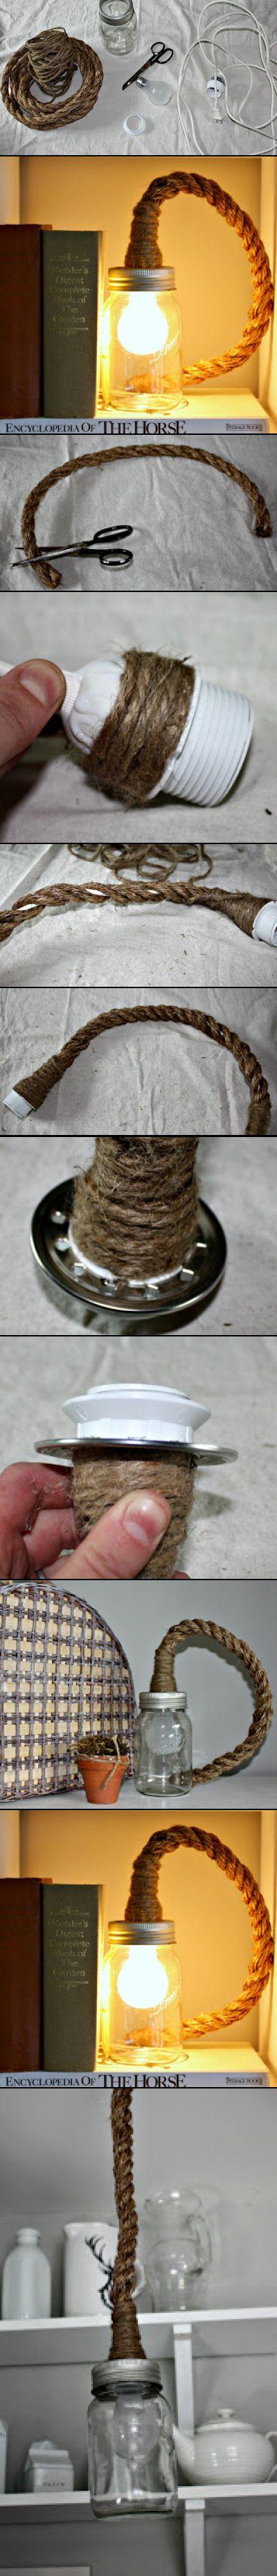 DIY Mason Jar Rope Light | #DIY